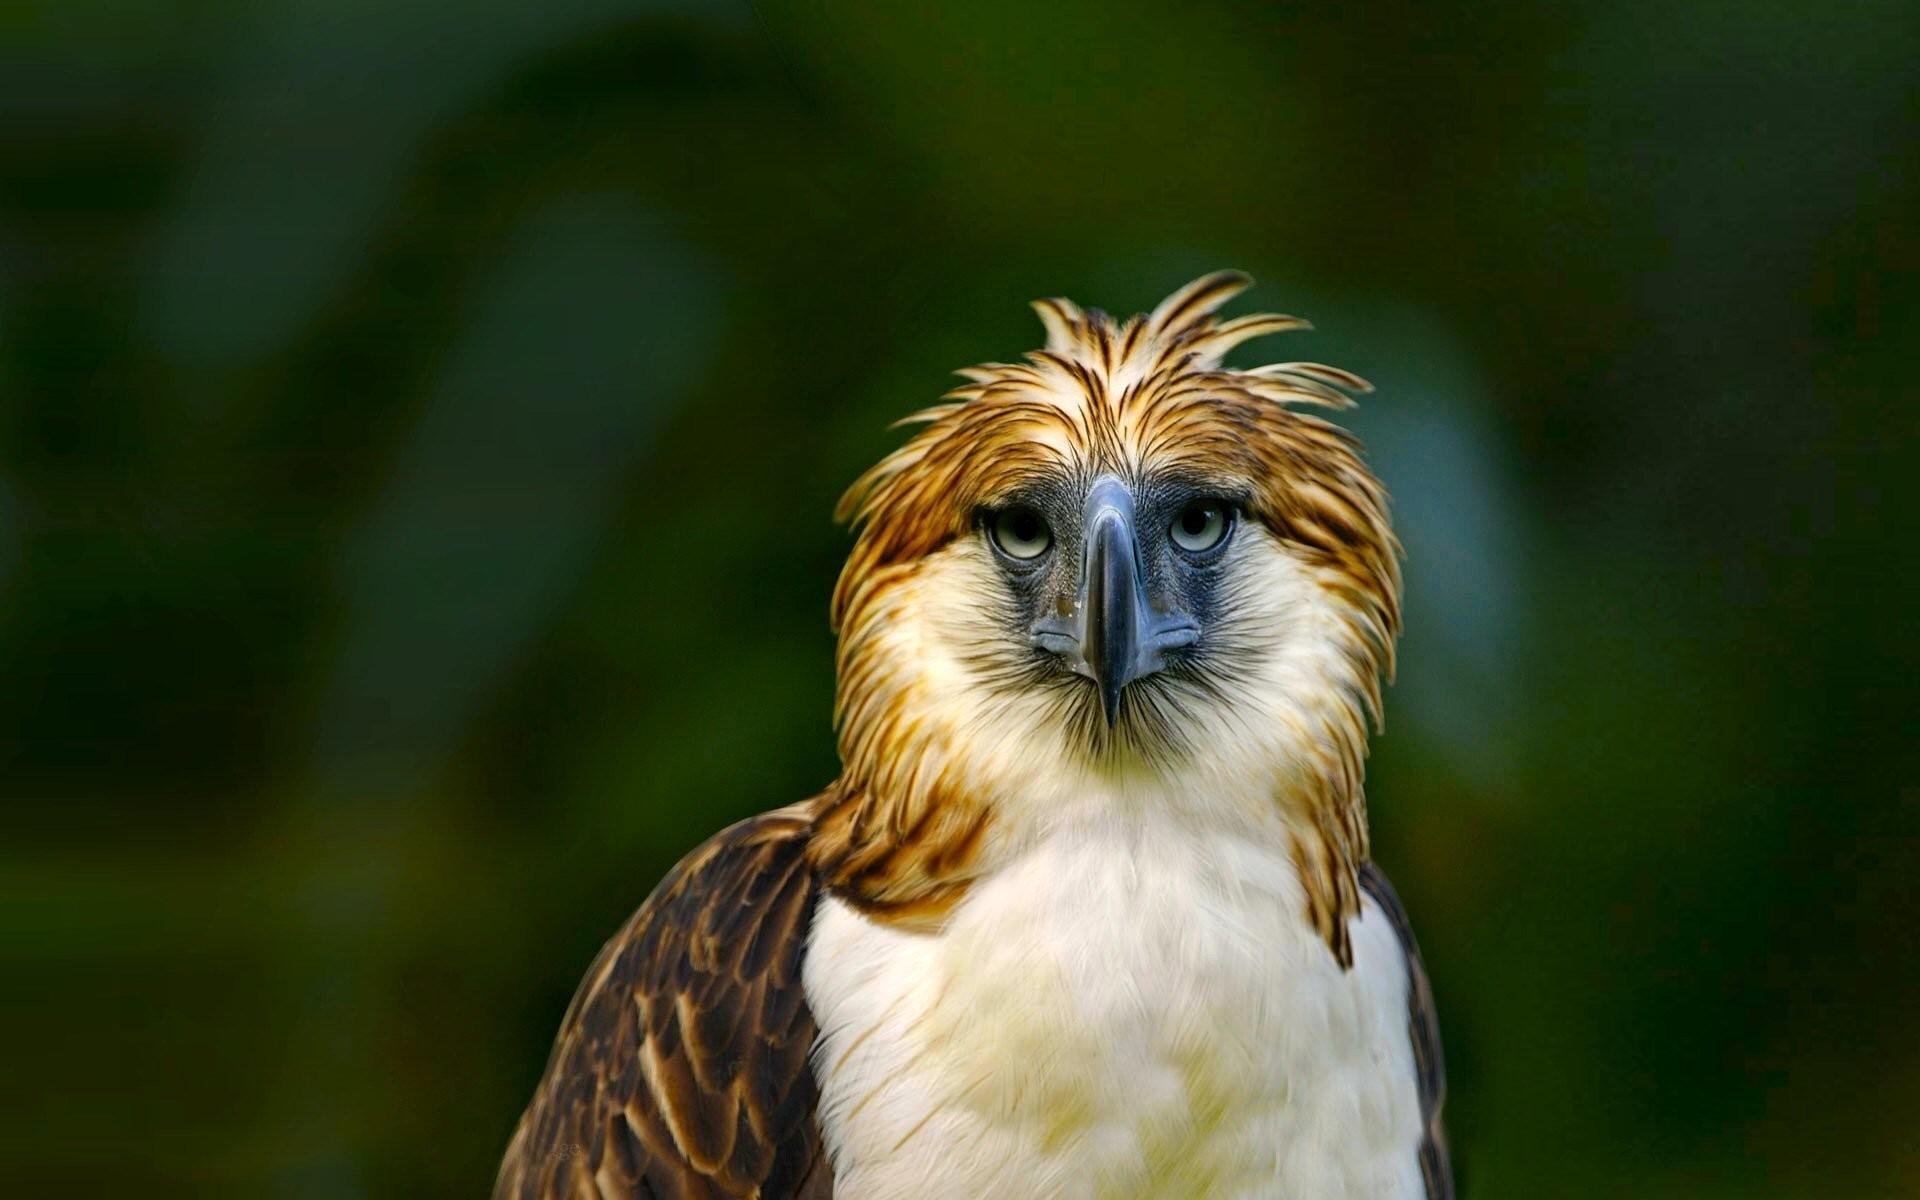 Bird wallpaper download free cool high resolution - Animal and bird hd wallpaper ...